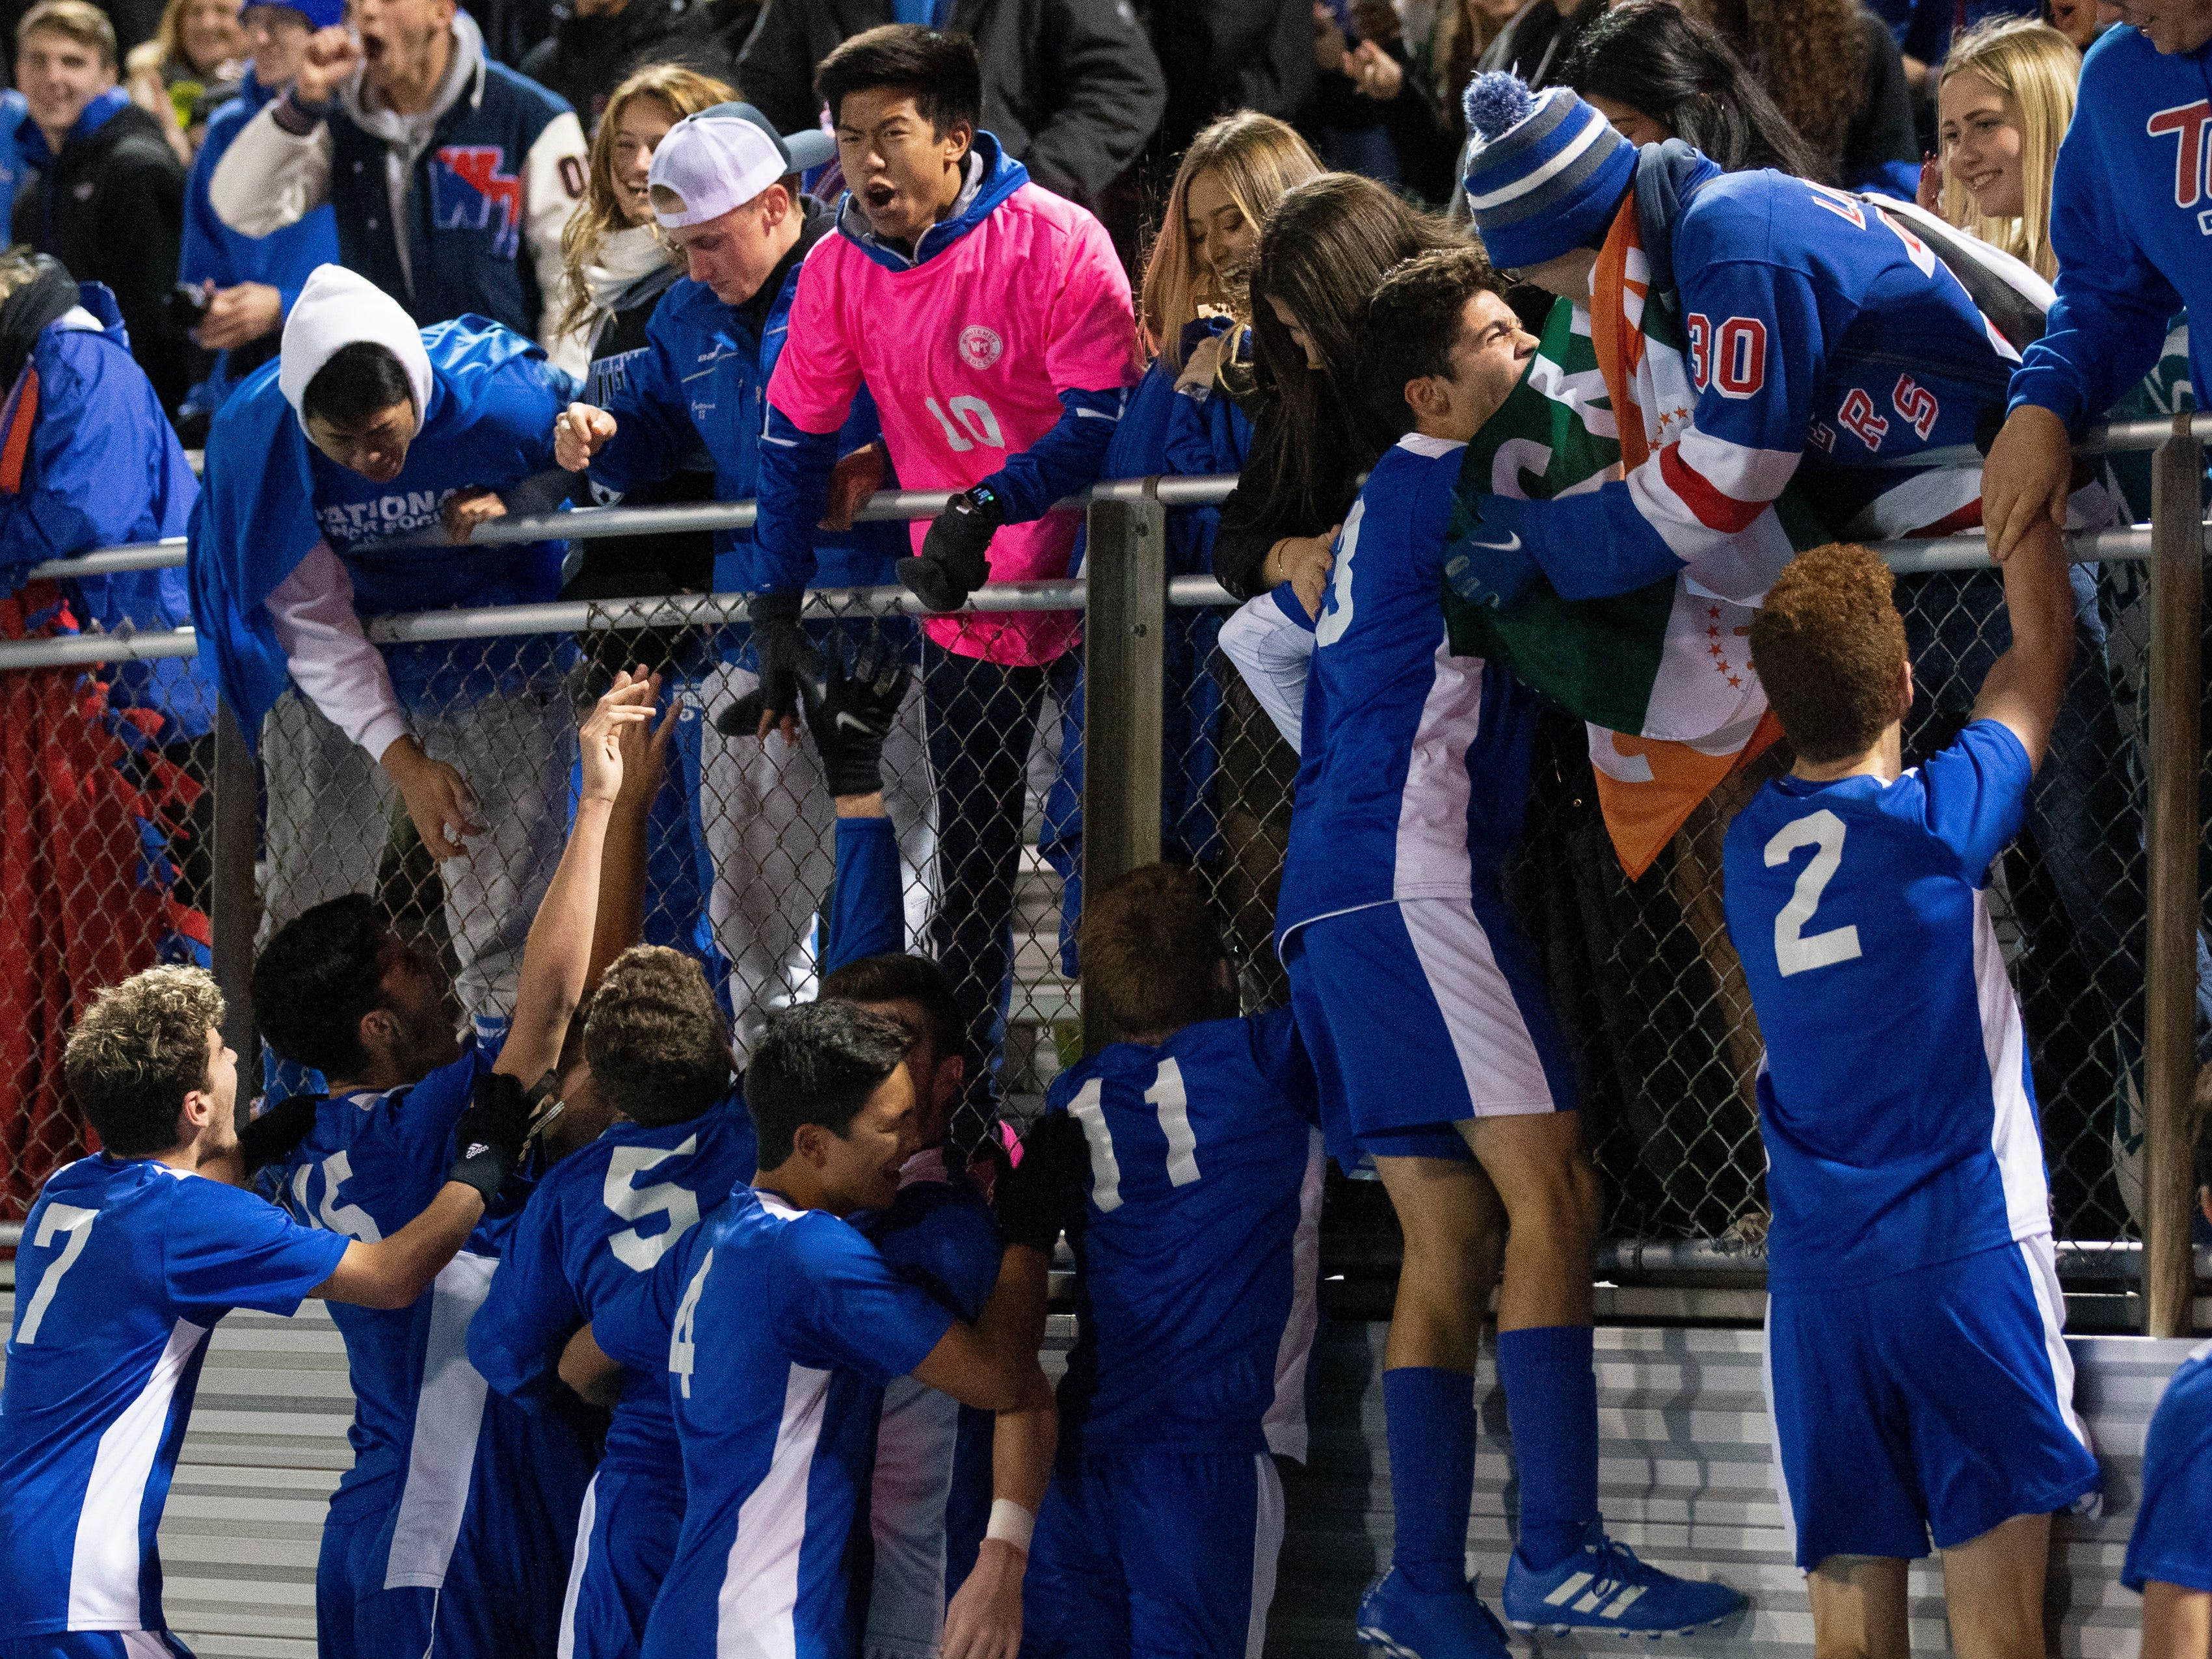 NJ Boys Soccer: Washington Township defeats Morris Knolls 2-0 in Group IV Final